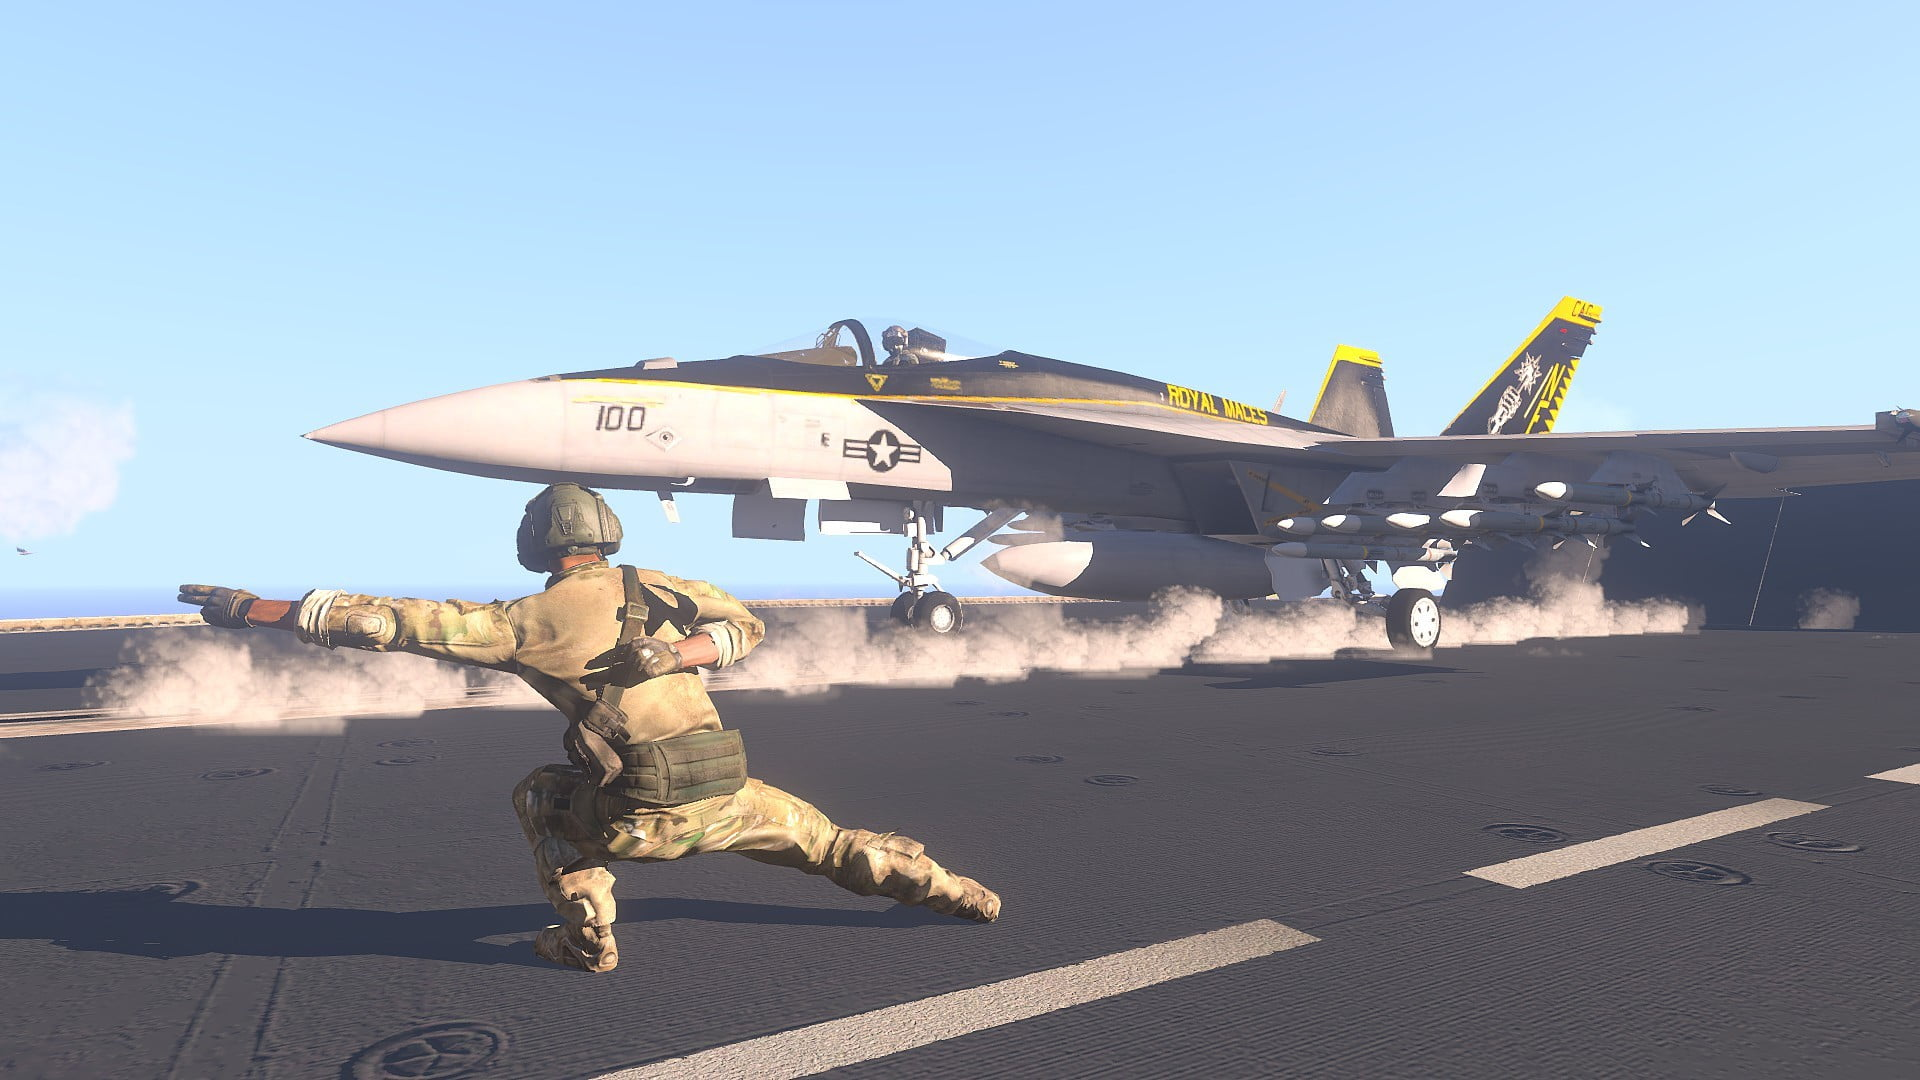 Iphone 2g Wallpaper Men S Brown Military Suit Fa 18 Hornet Arma 3 Aircraft